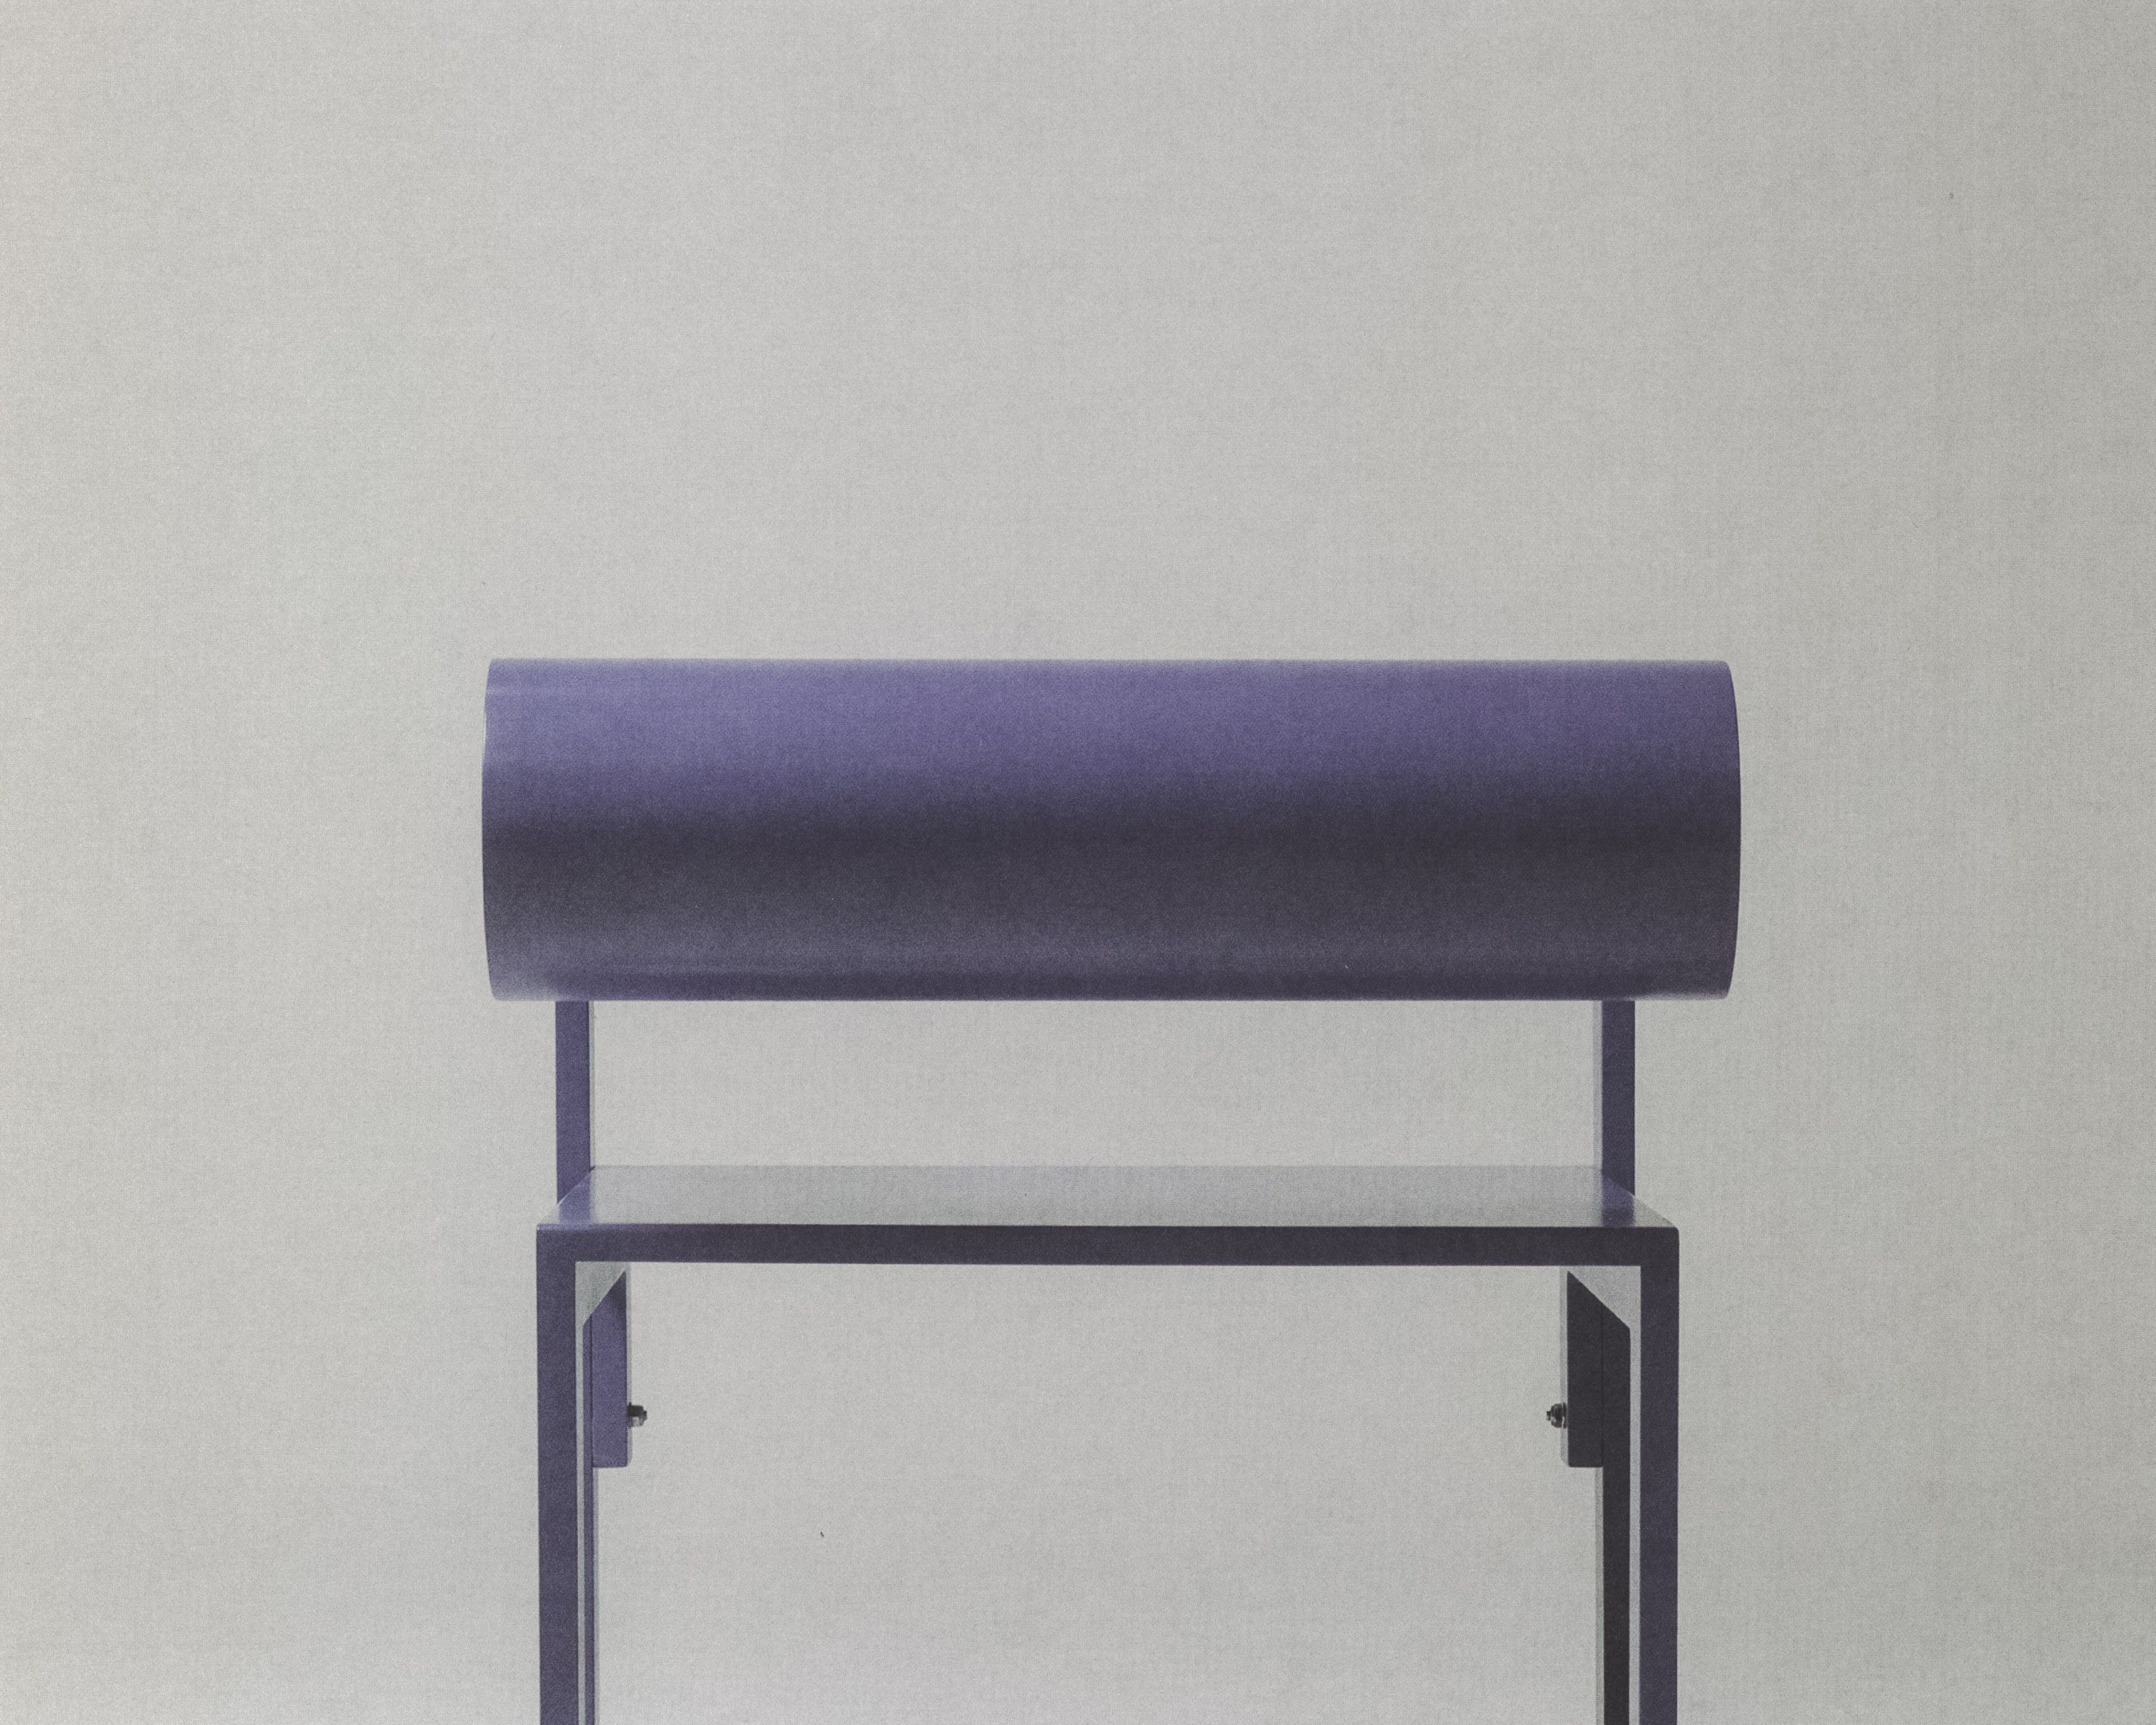 Purple Cylinder Back Arm product image 3